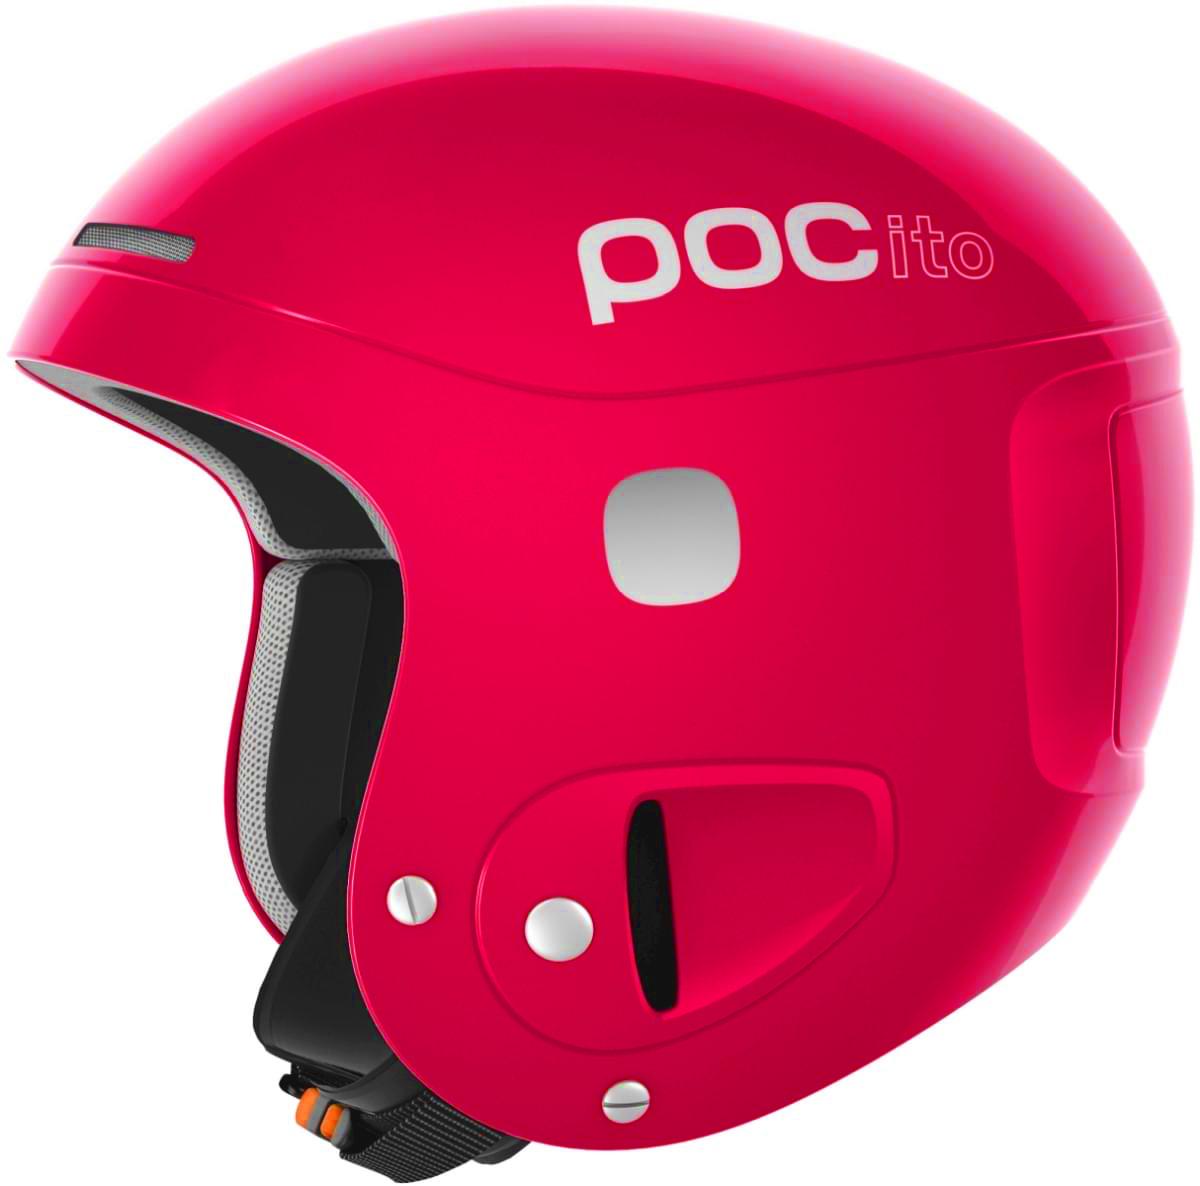 POC POCito Skull-fluorescent pink adj. 51-54